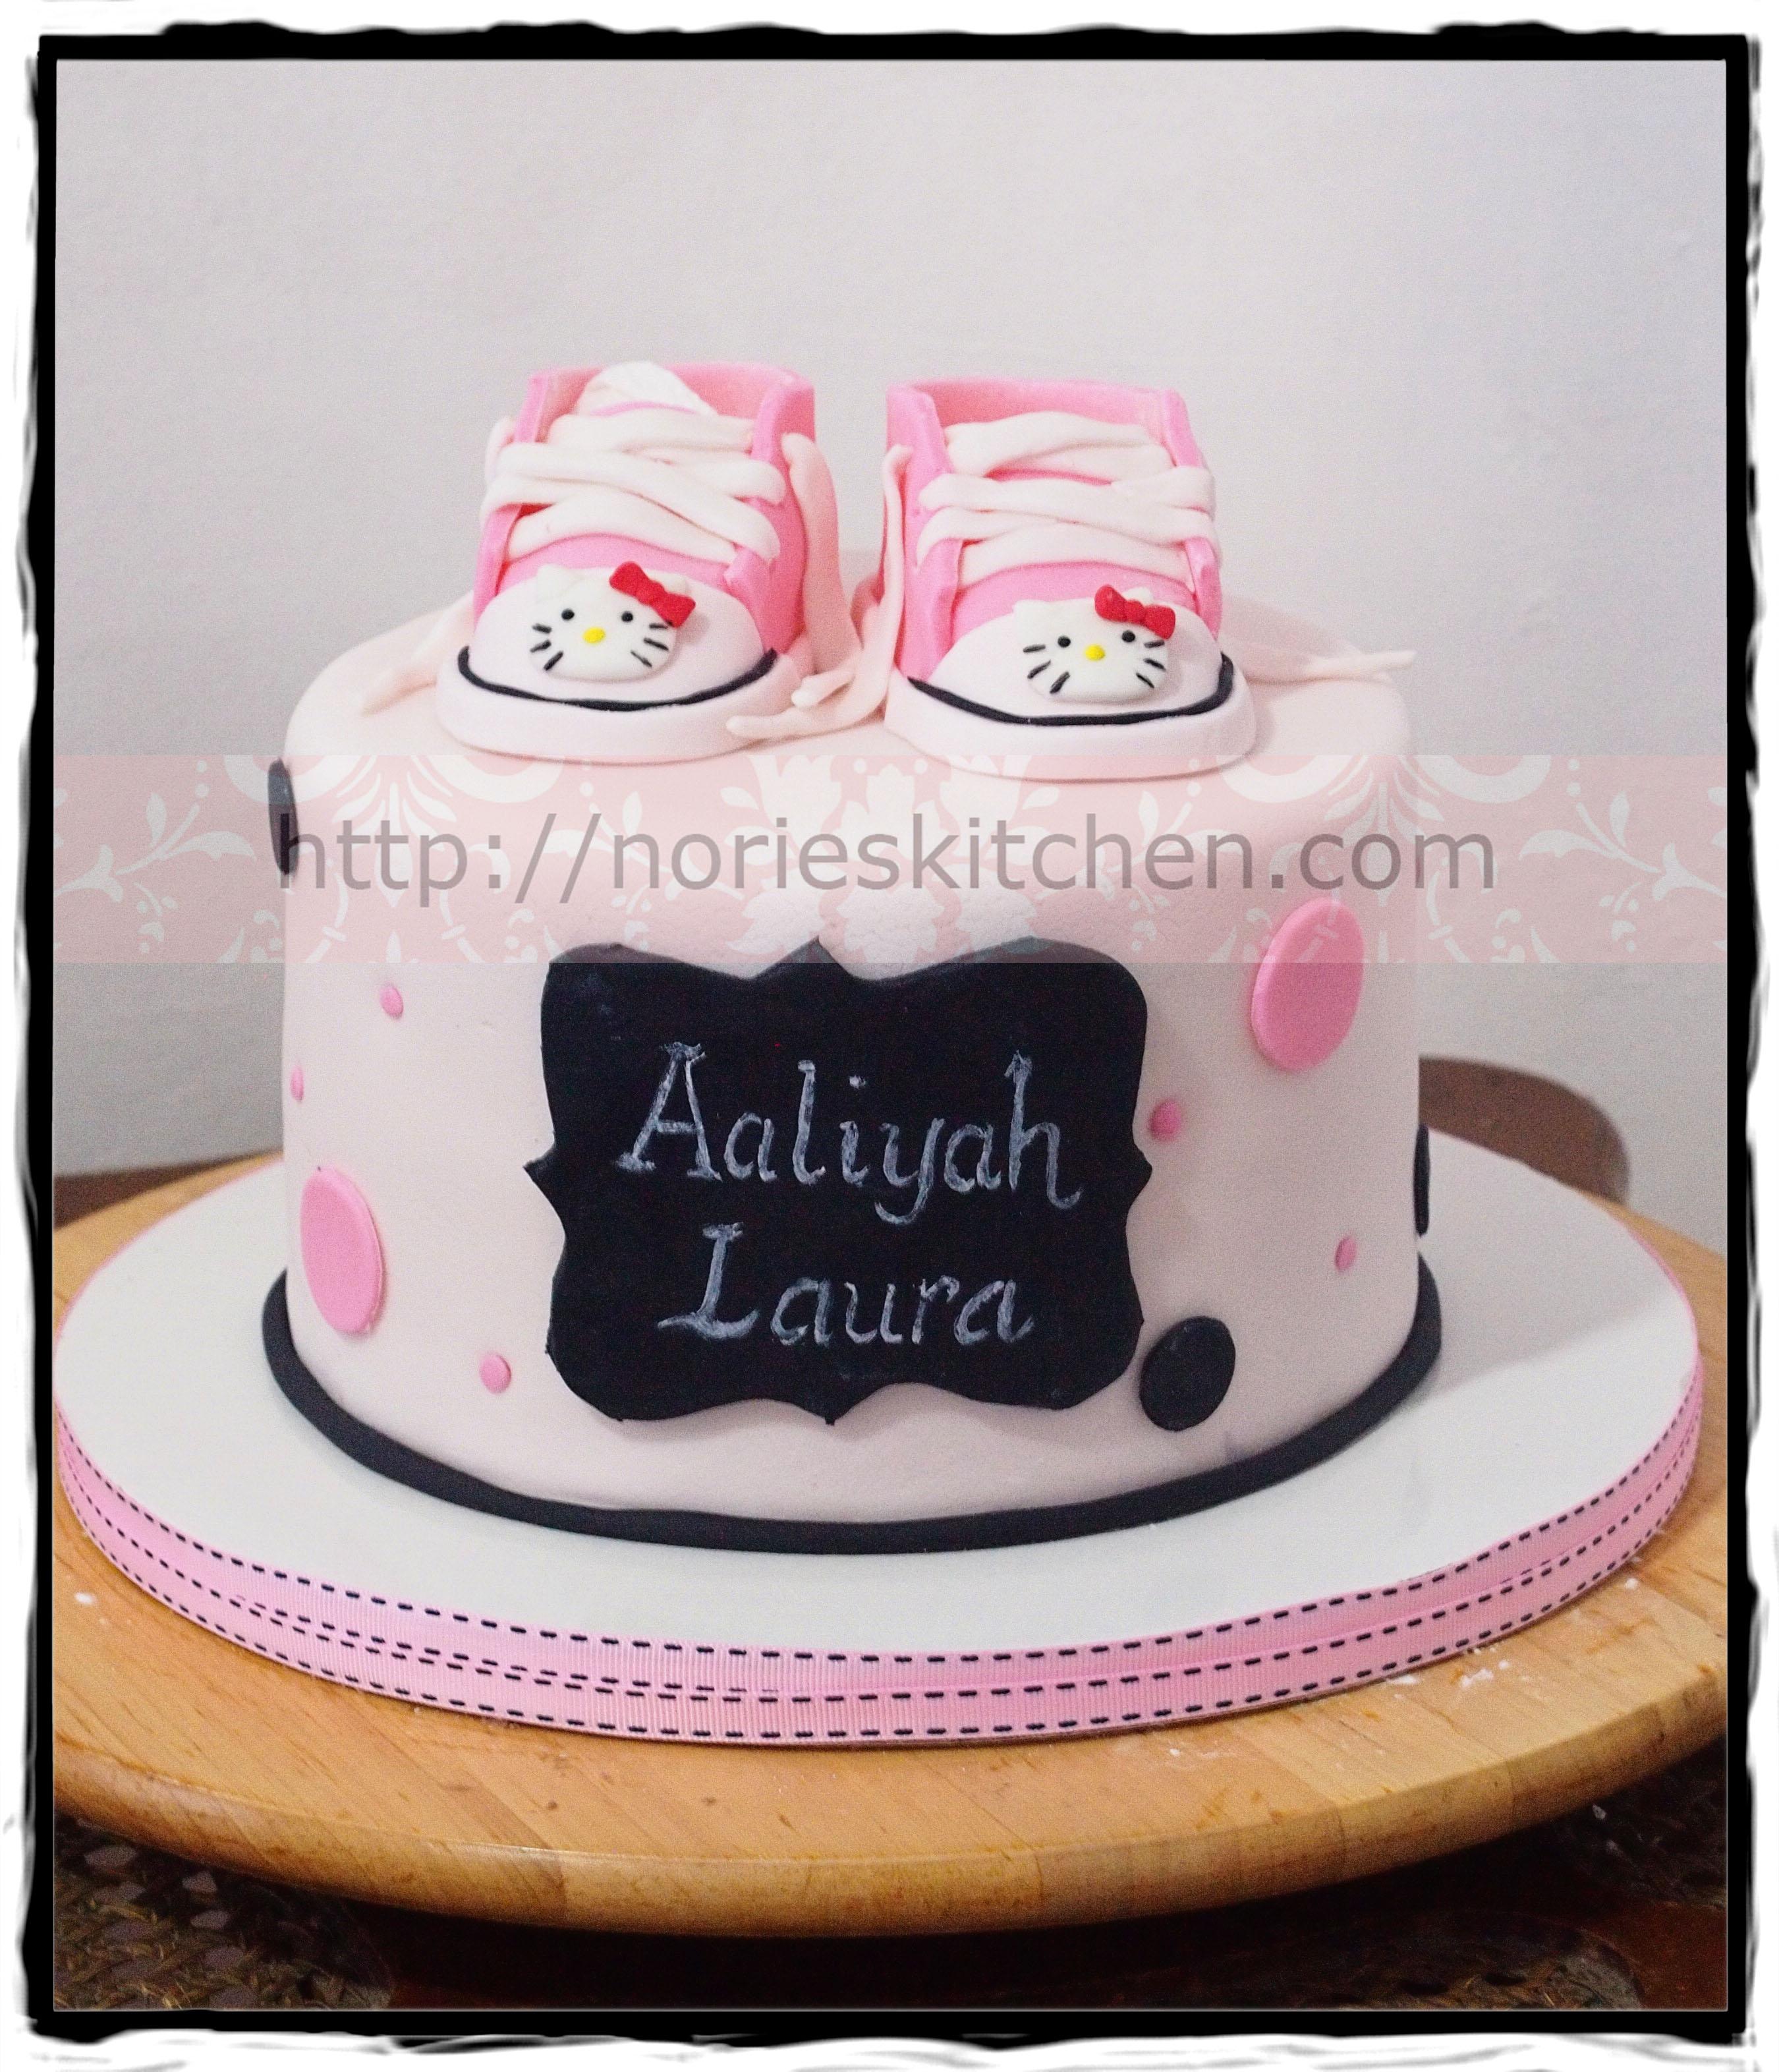 Nories Kitchen Custom Cakes Custom Cakes and Premium Pastries in